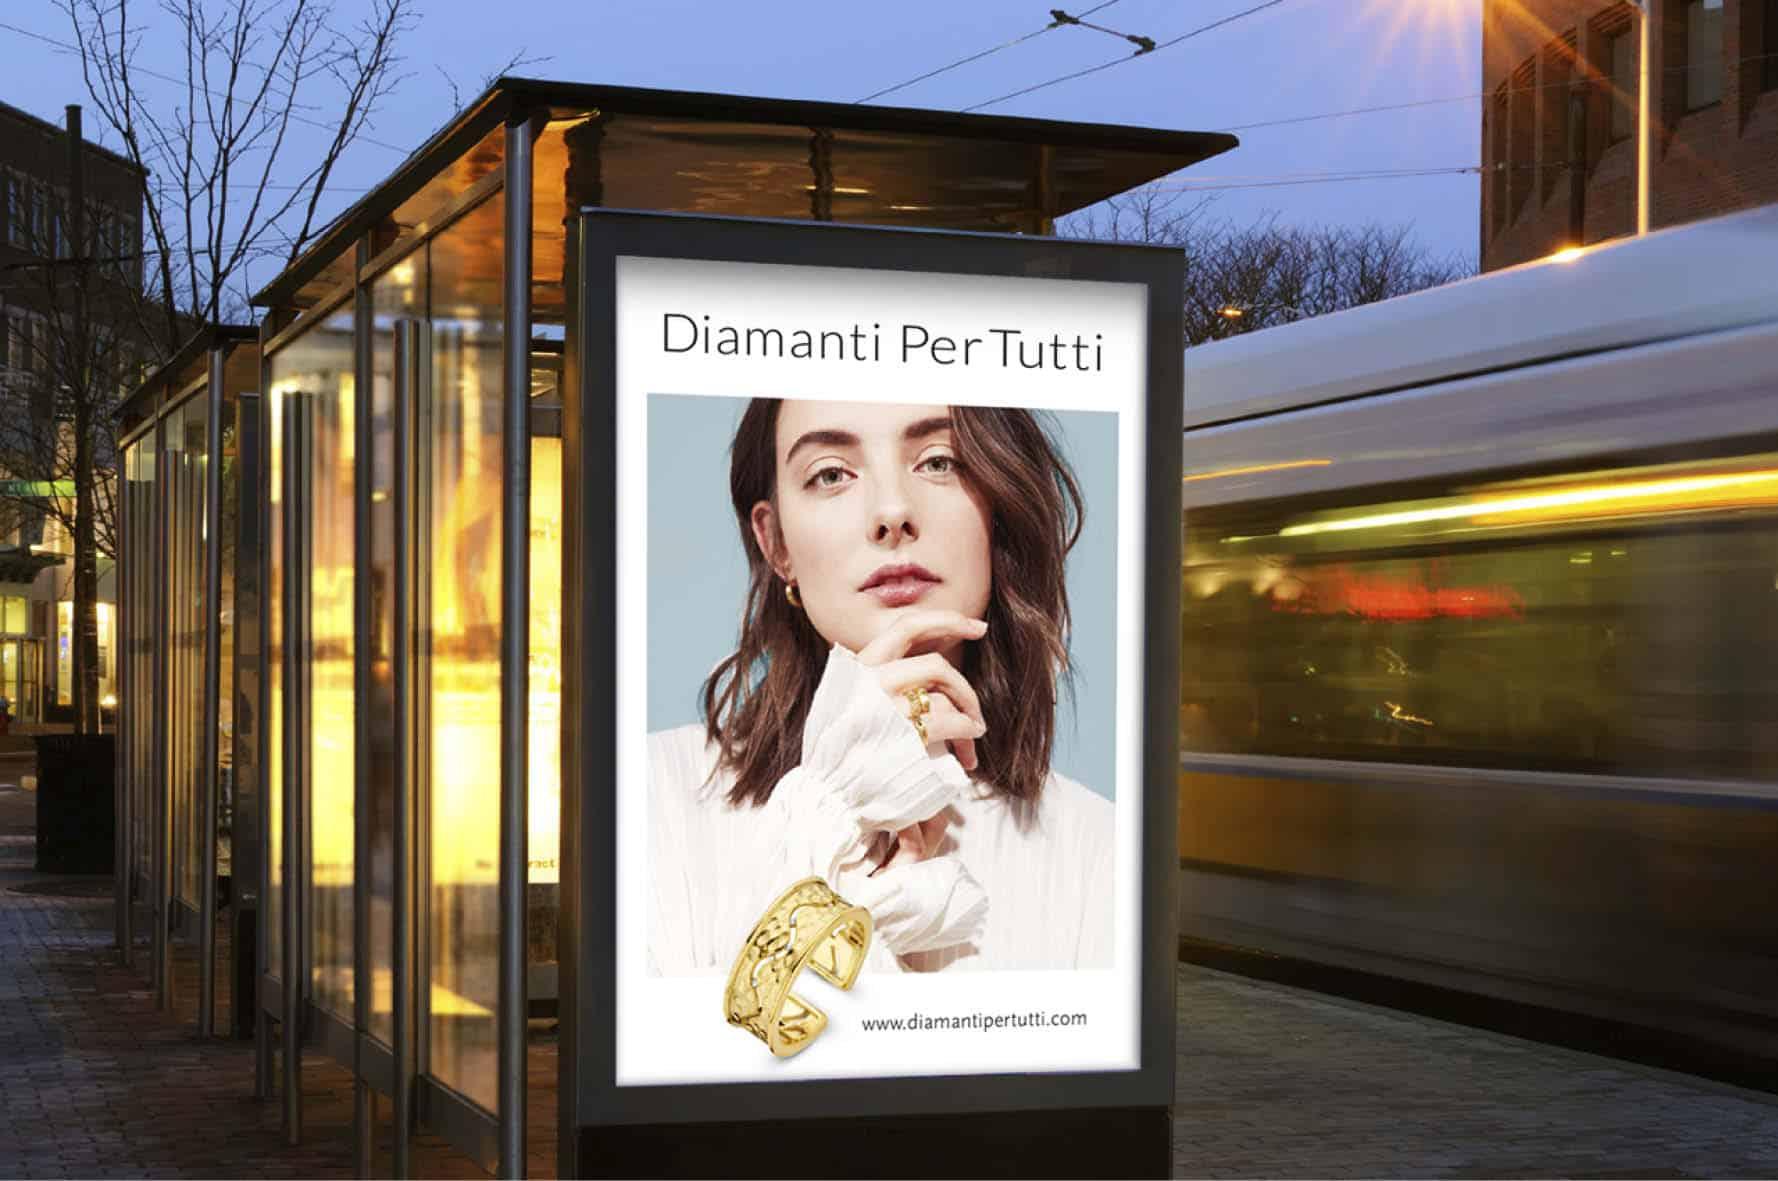 Outside advertising Diamanti Per Tutti